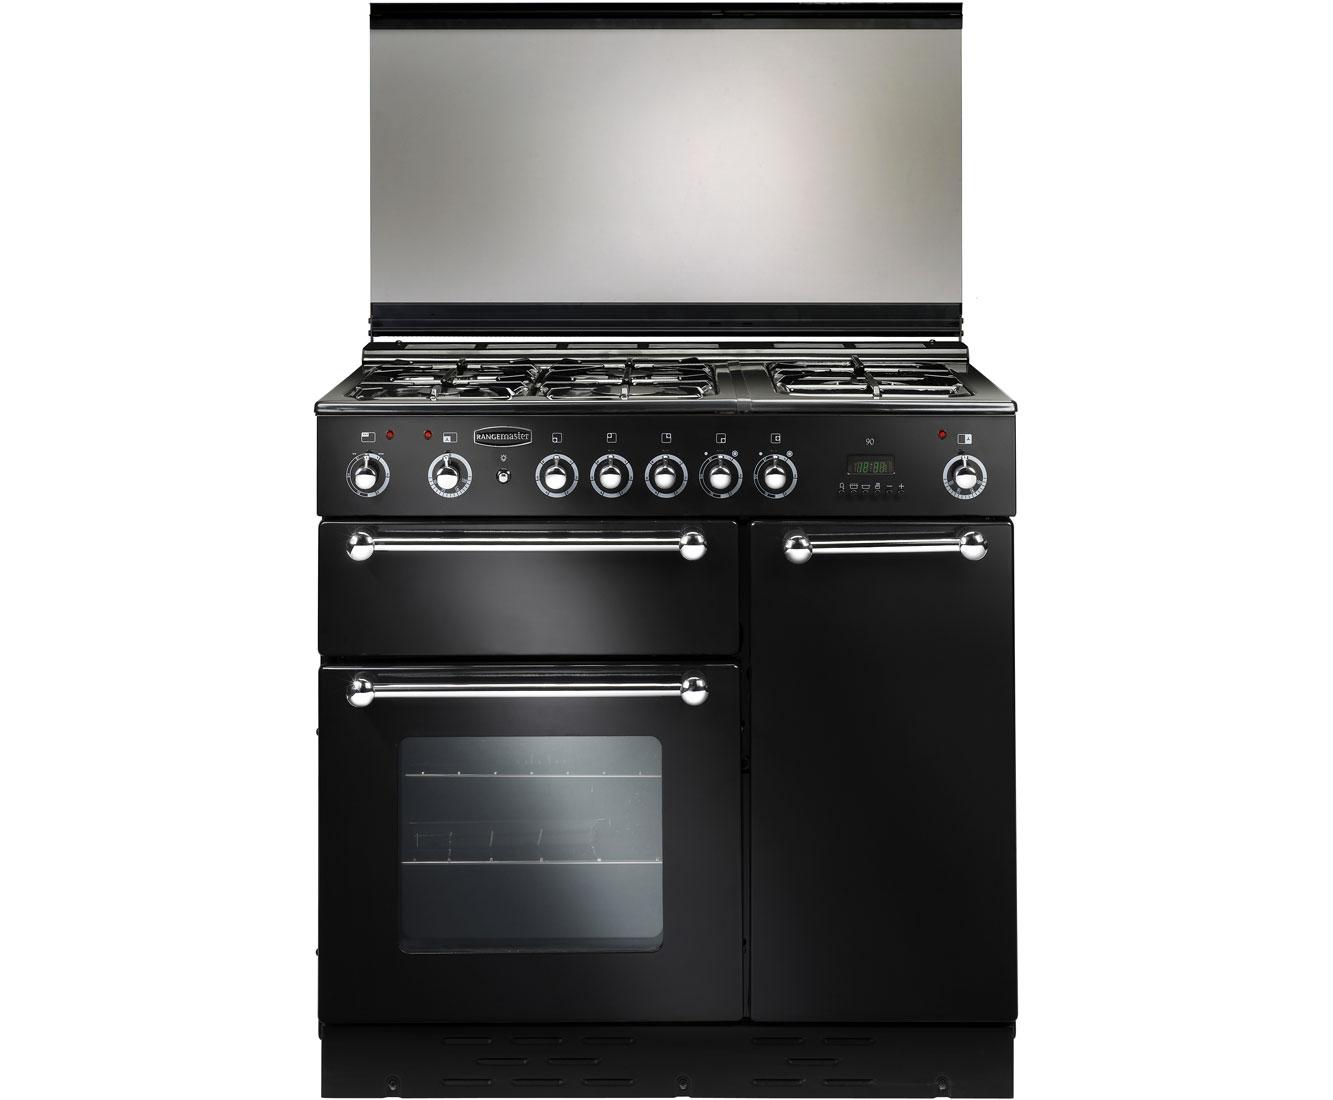 Rangemaster RMS90DFFBLPDC Free Standing Range Cooker in Black  Chrome